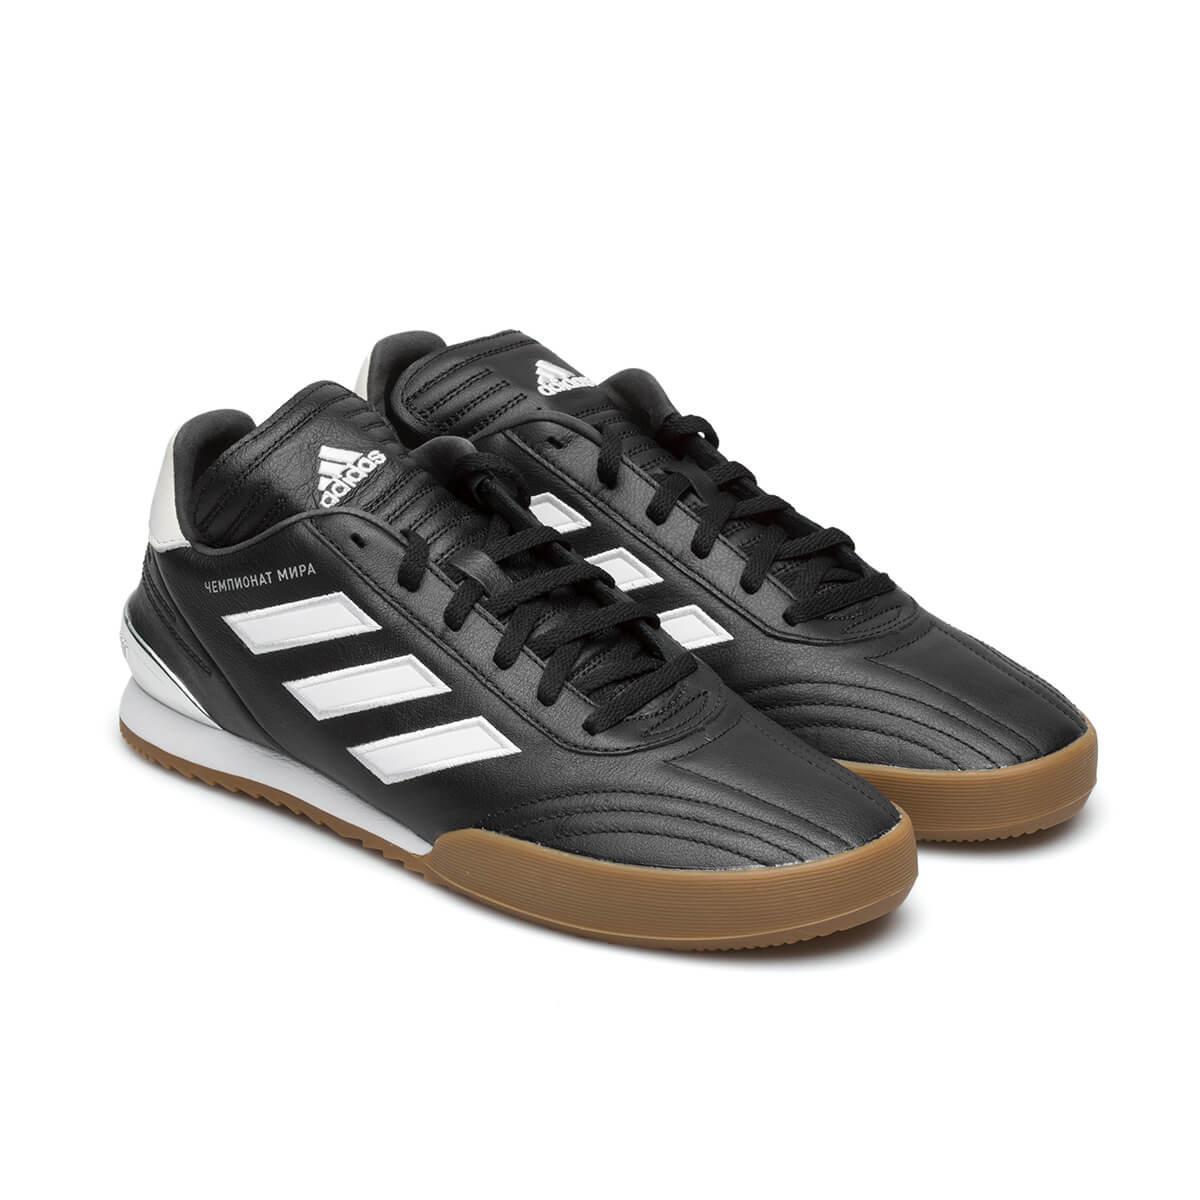 brand new bd7df 71269 Gosha Rubchinskiy - Black Adidas Copa Sneaker for Men - Lyst. View  fullscreen